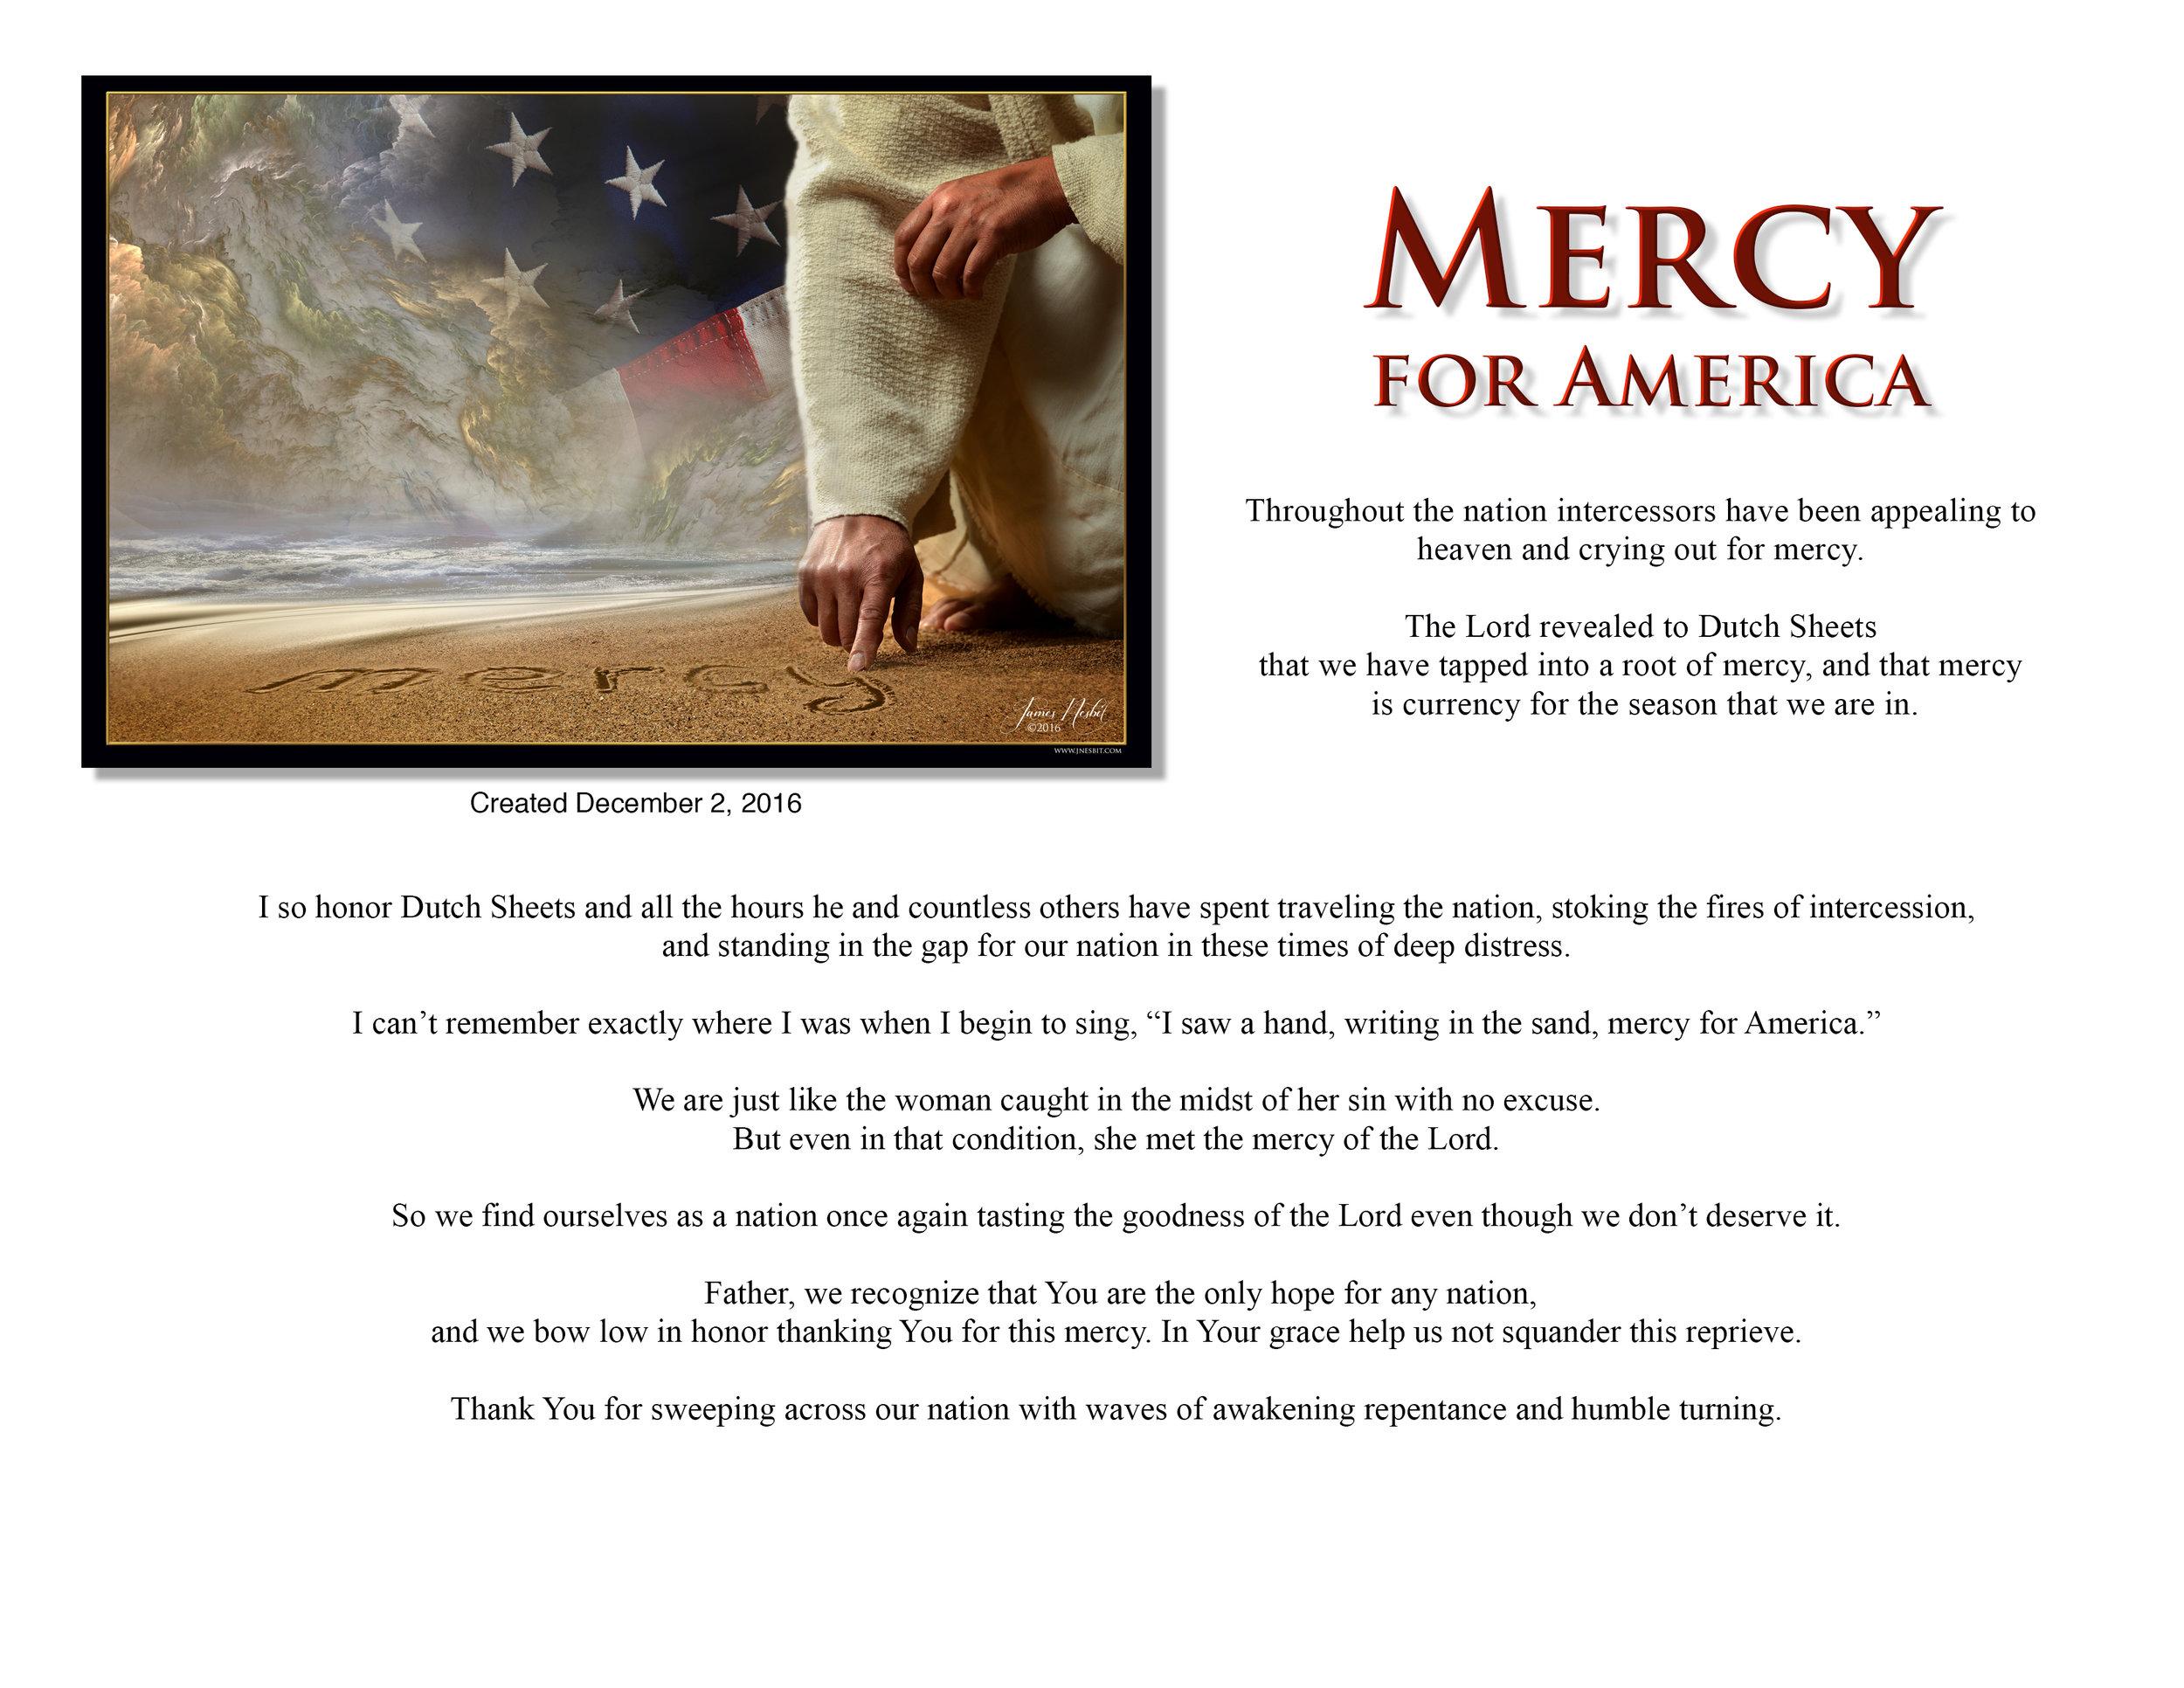 Mercy for America description .jpg